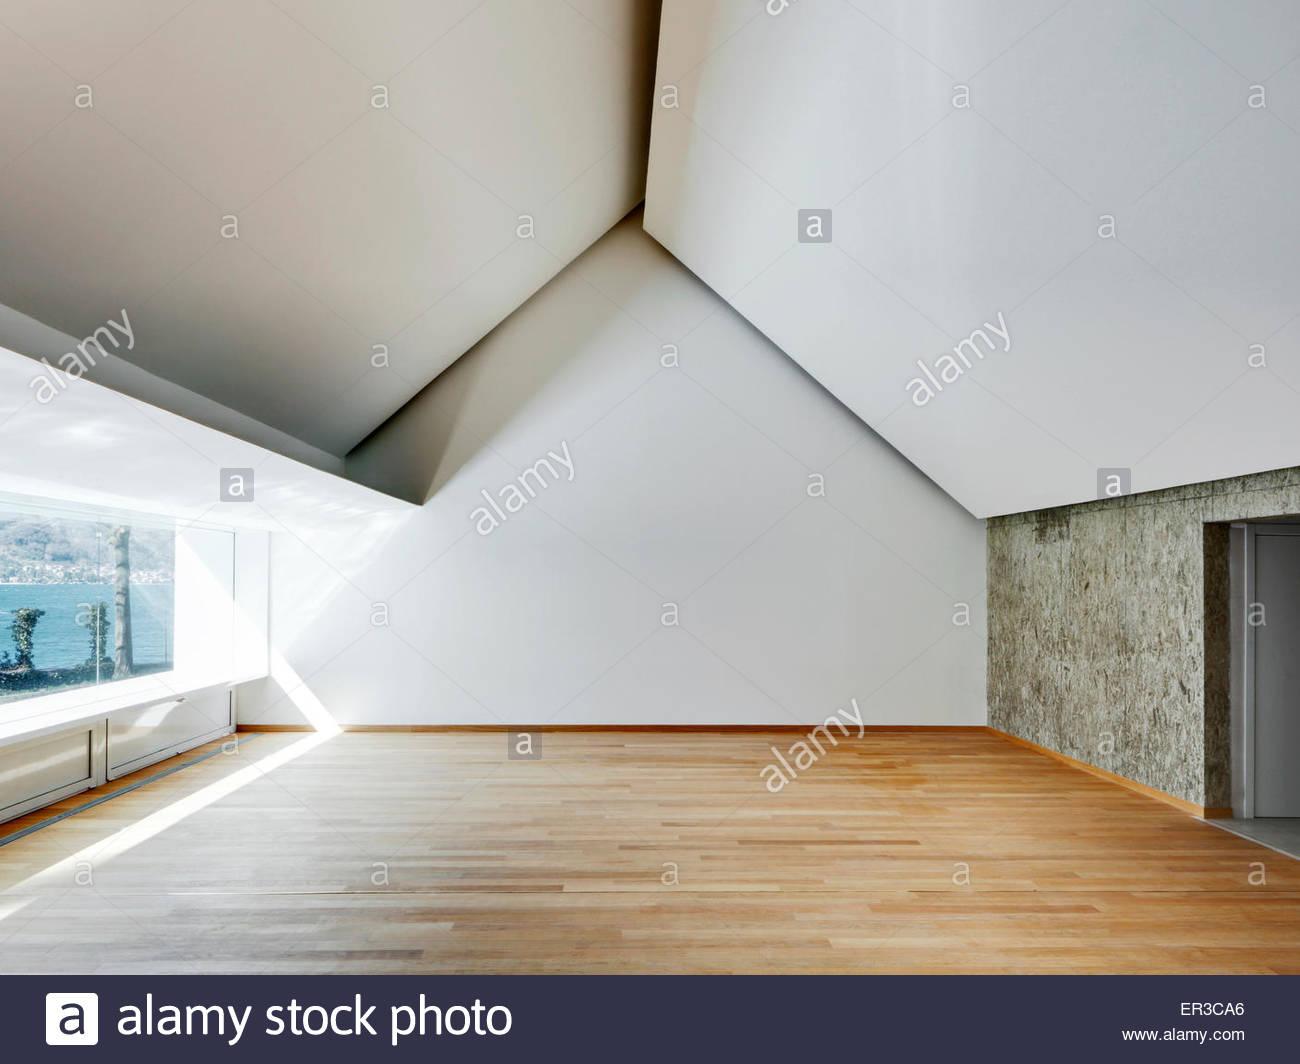 architecture interiors empty apartment room stock photos